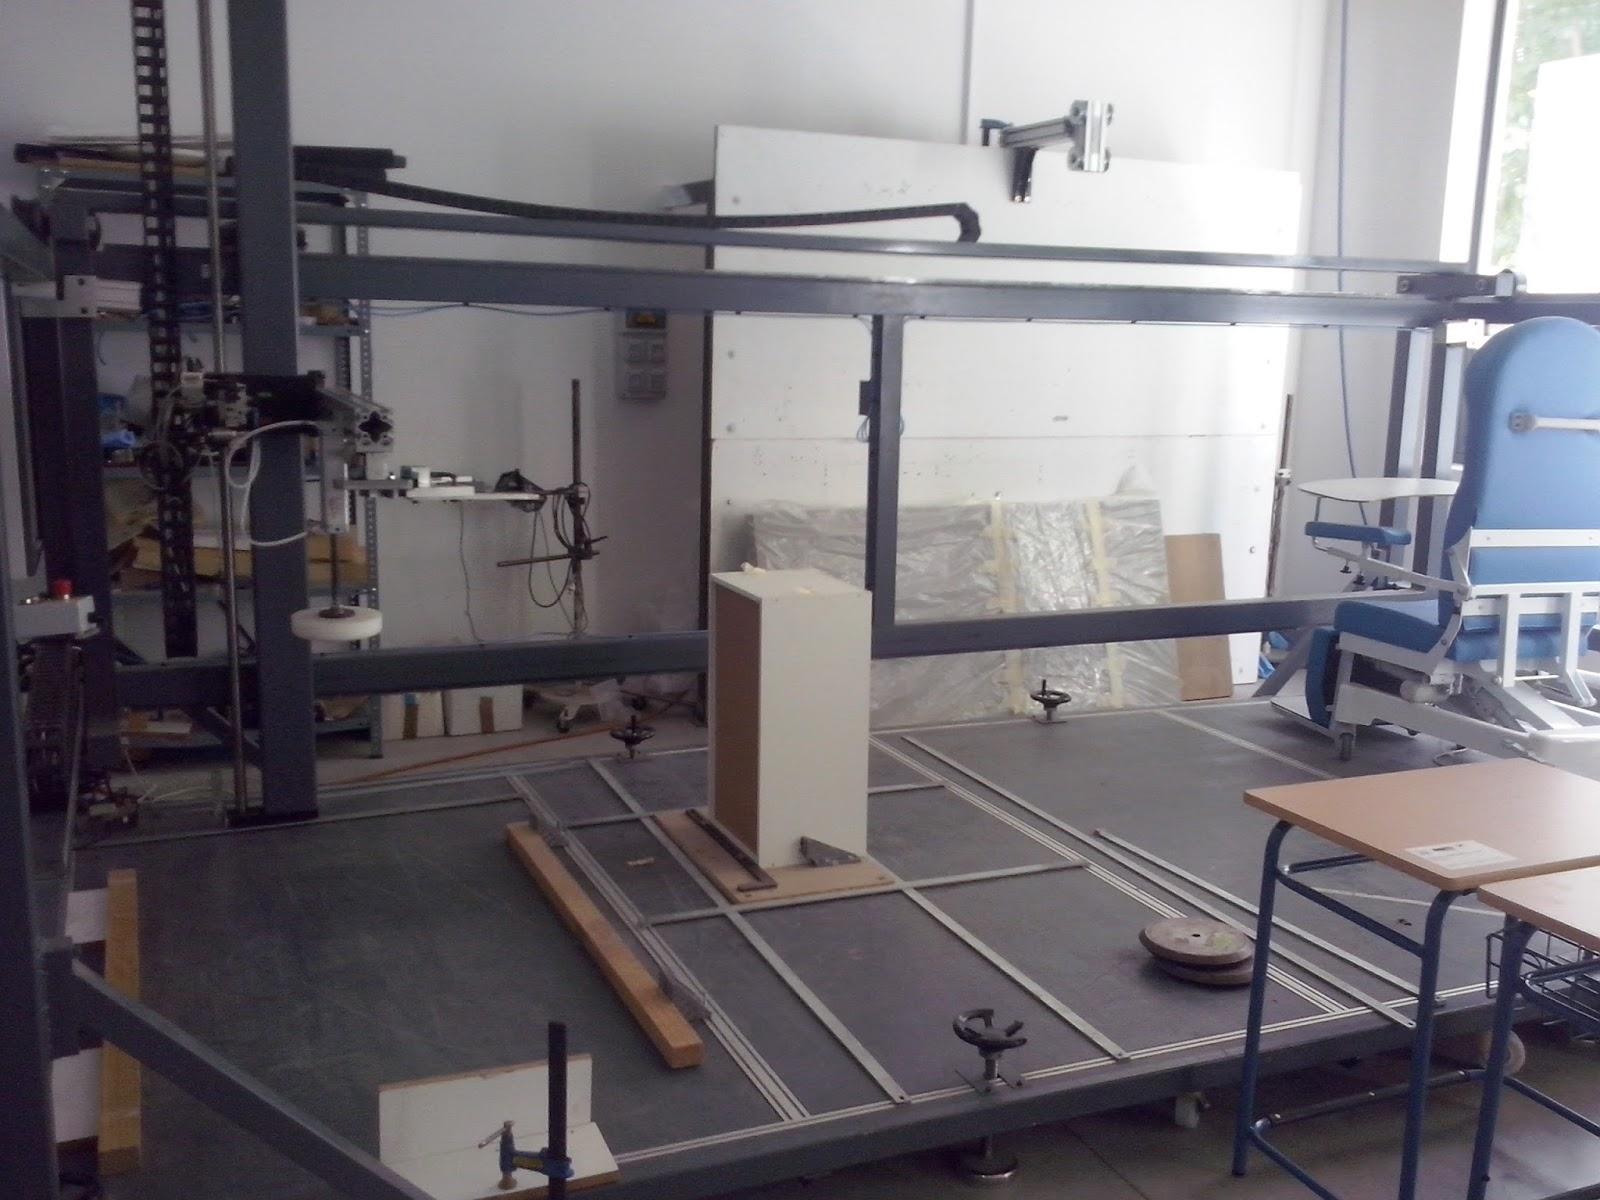 Fp madera murcia visita cetem centro tecnologico del - Centro comercial del mueble ...